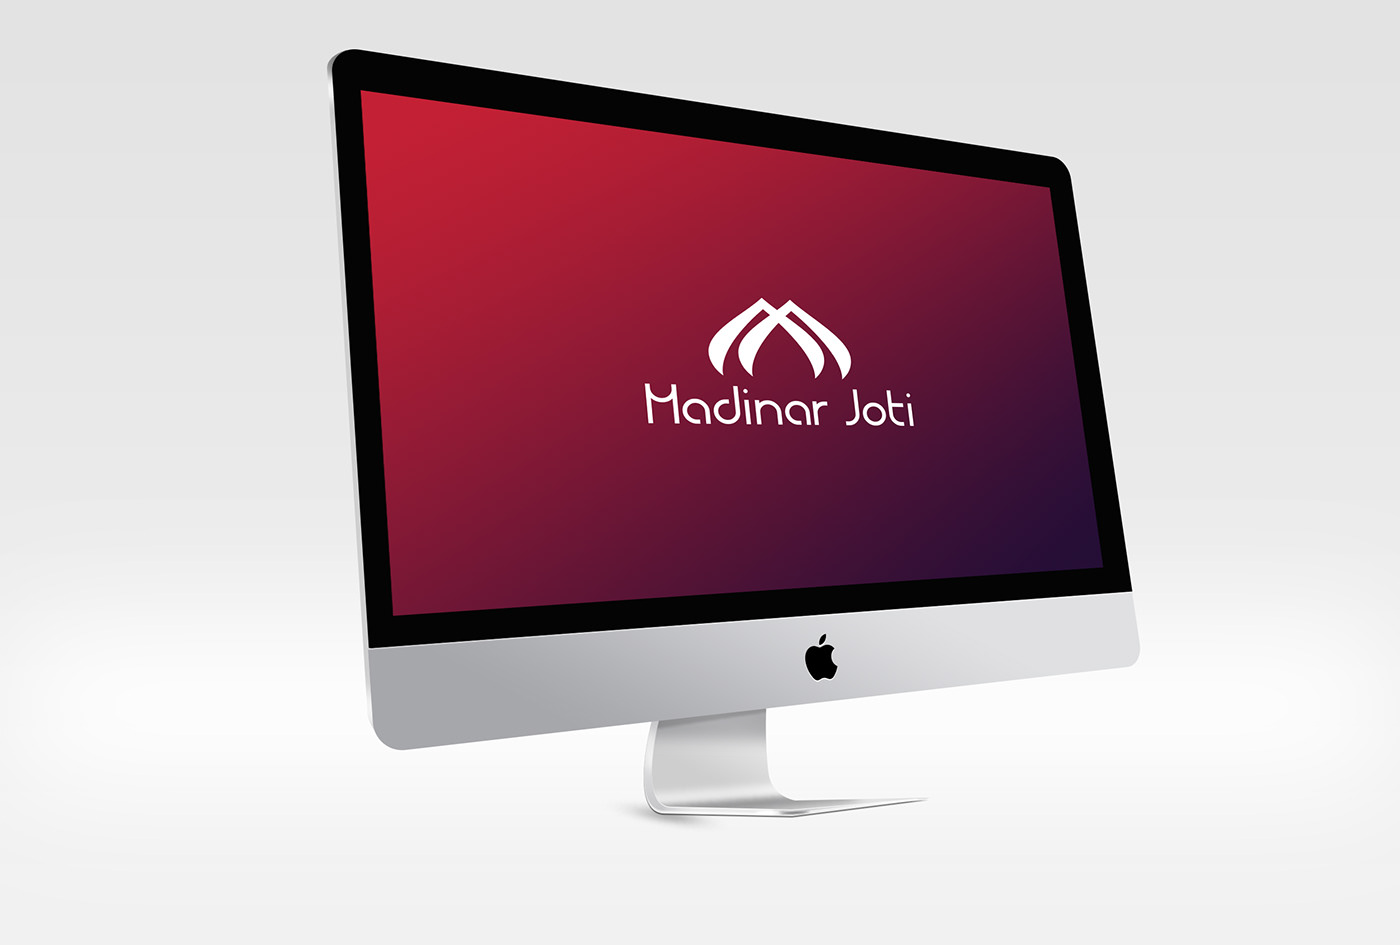 Image may contain: electronics, monitor and computer monitor